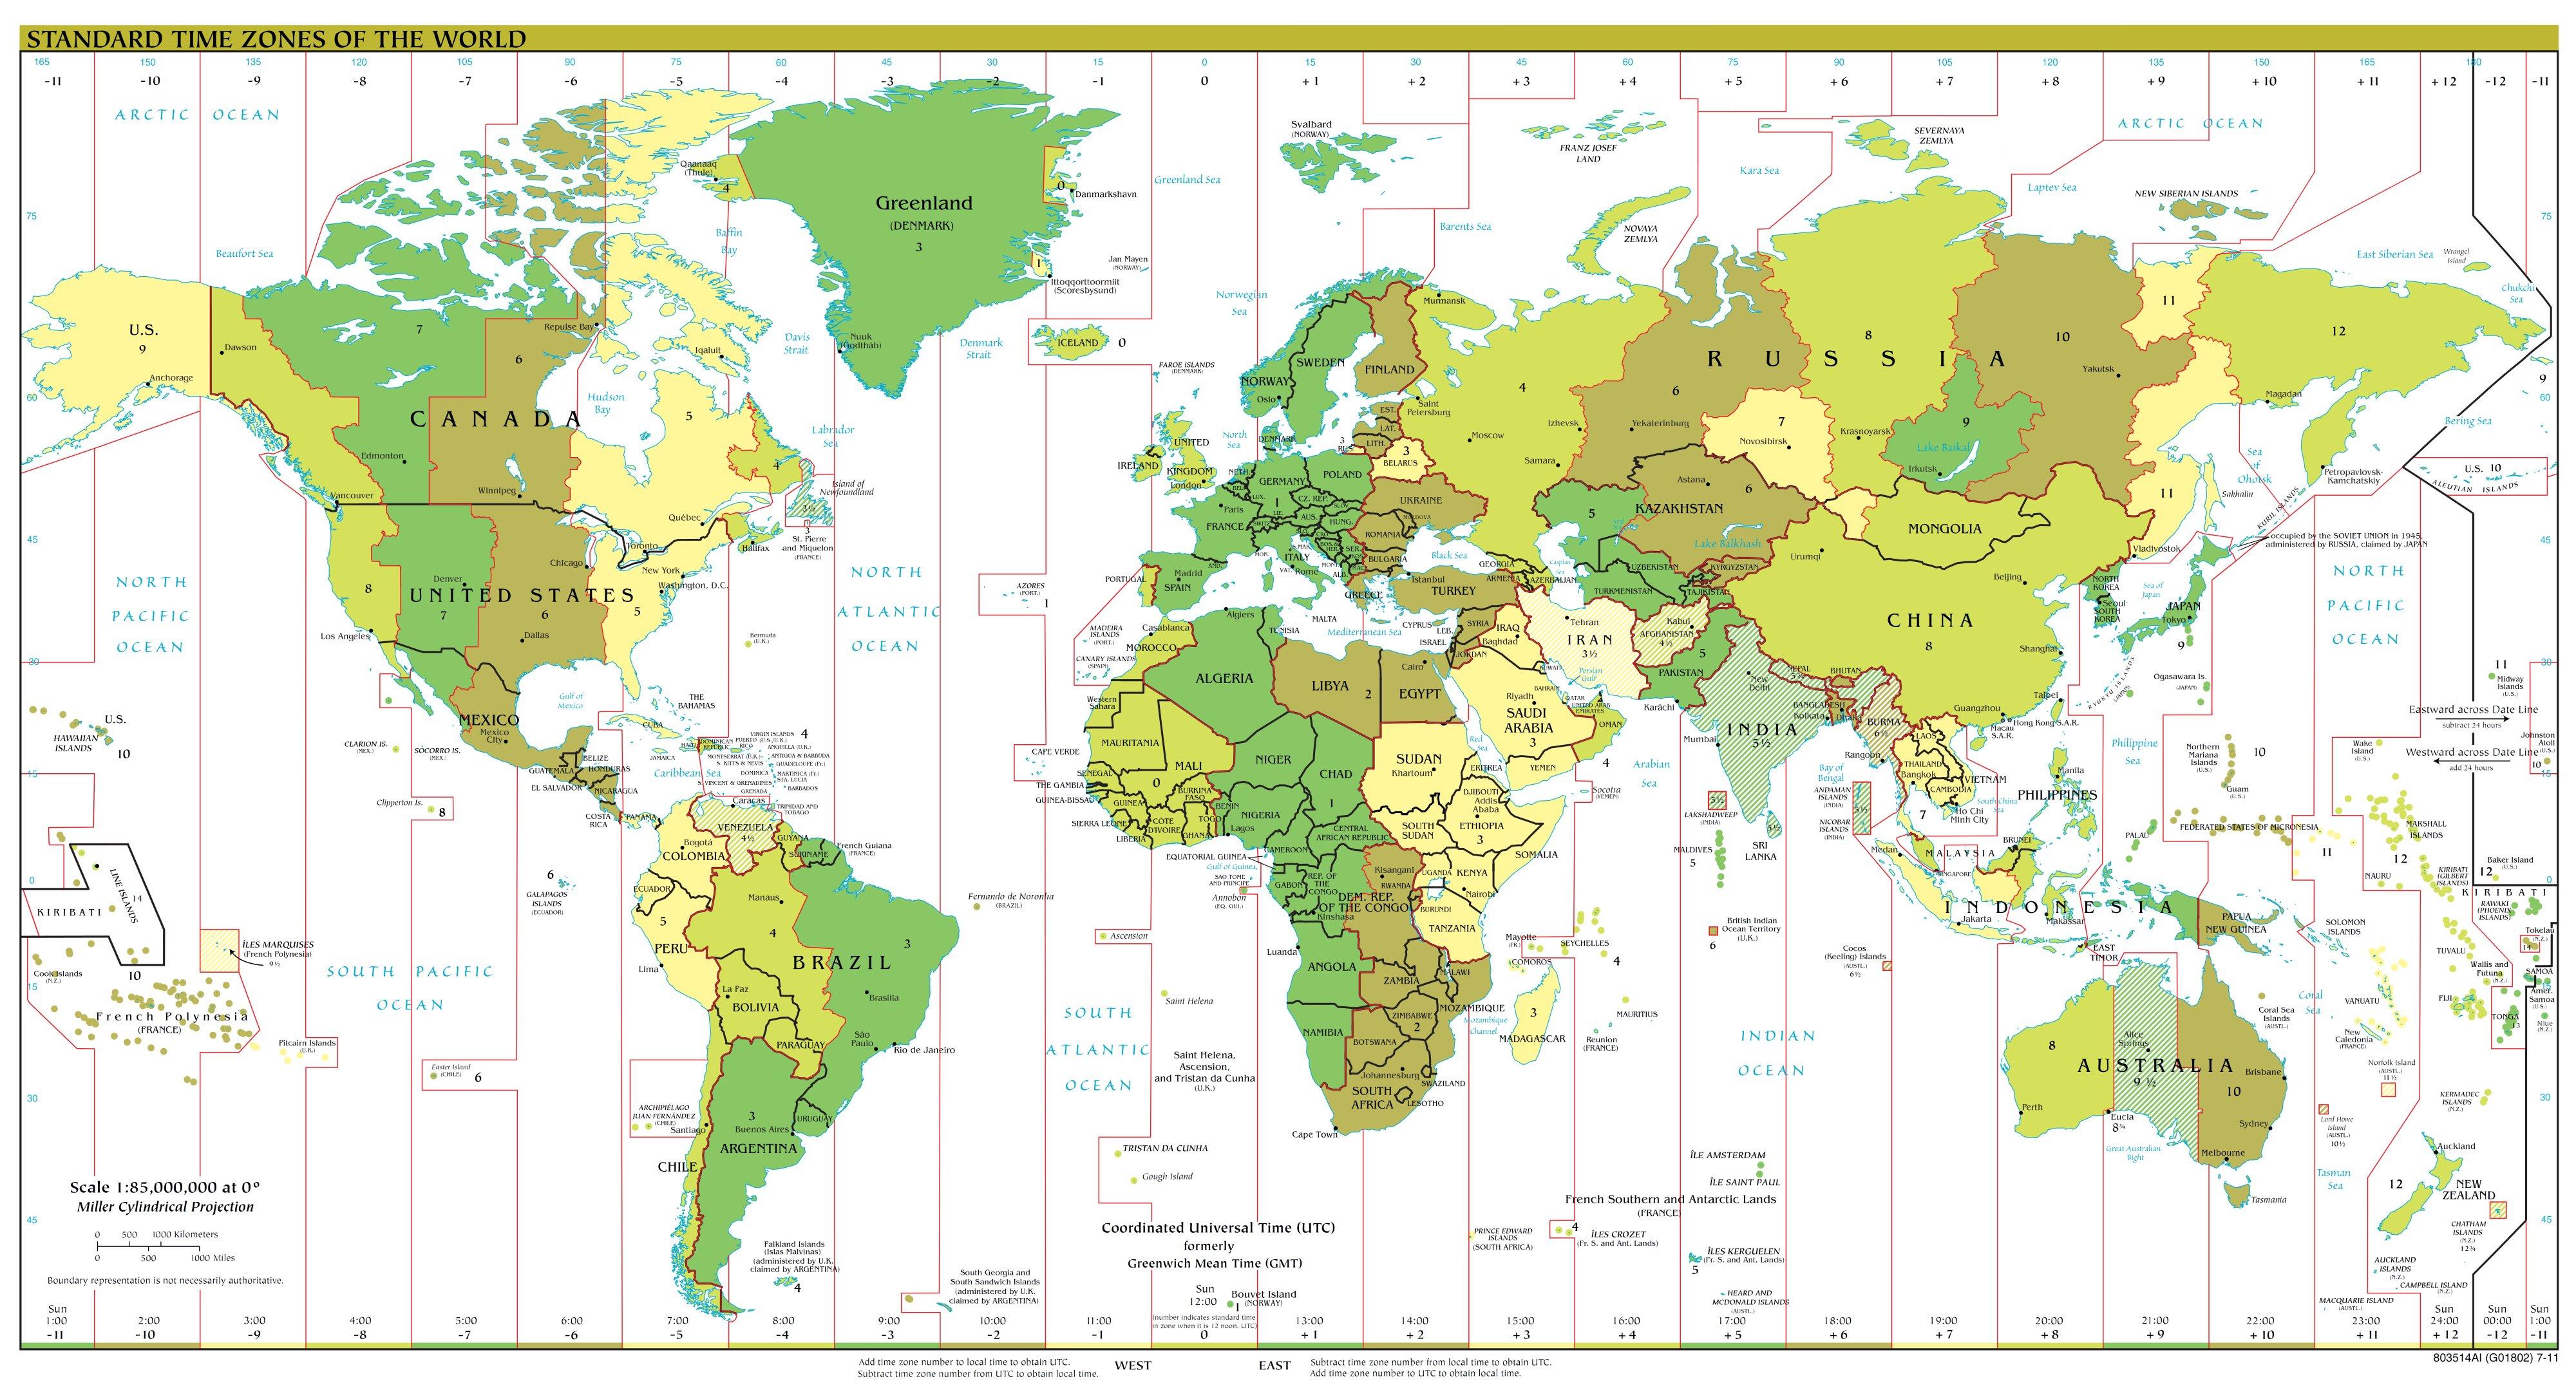 Die Welt Karte.Weltkarte Zeitzonen Weltkarte Com Karten Und